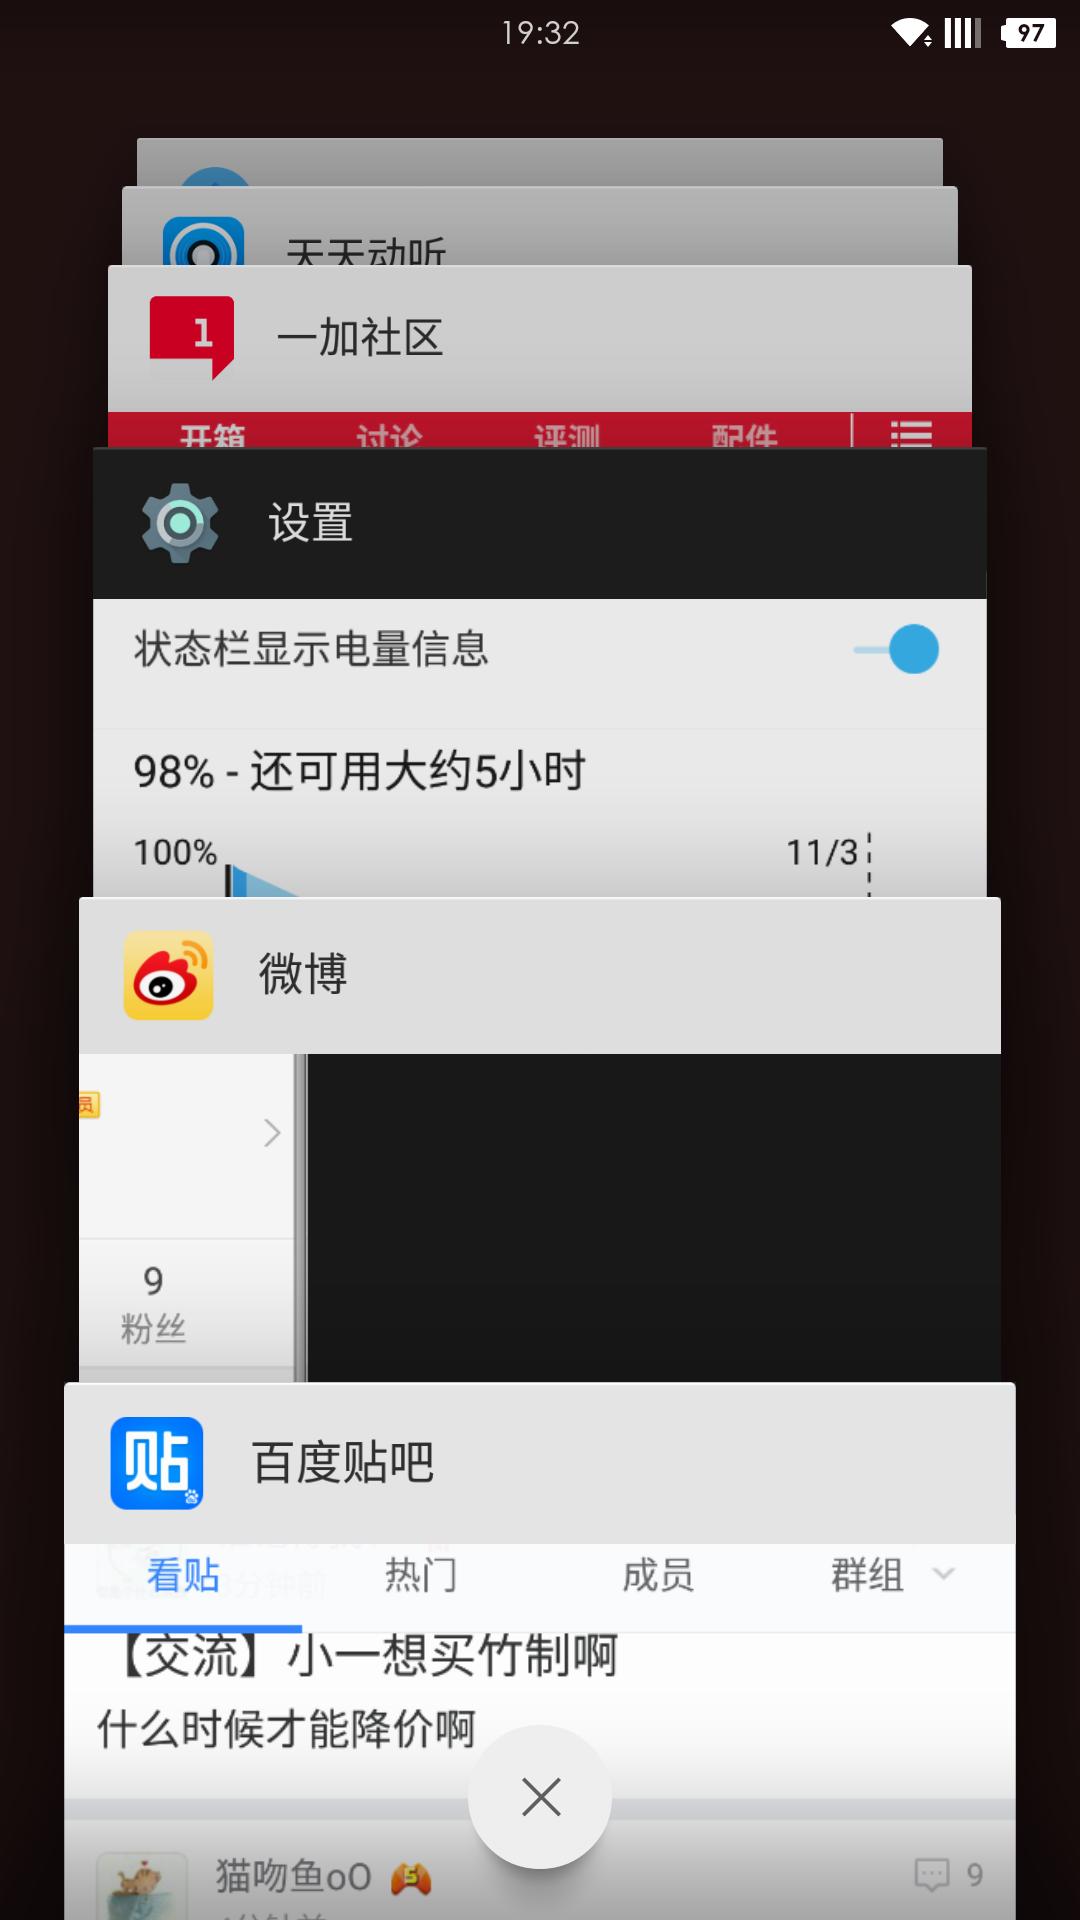 Screenshot_2015-11-02-19-32-20.png